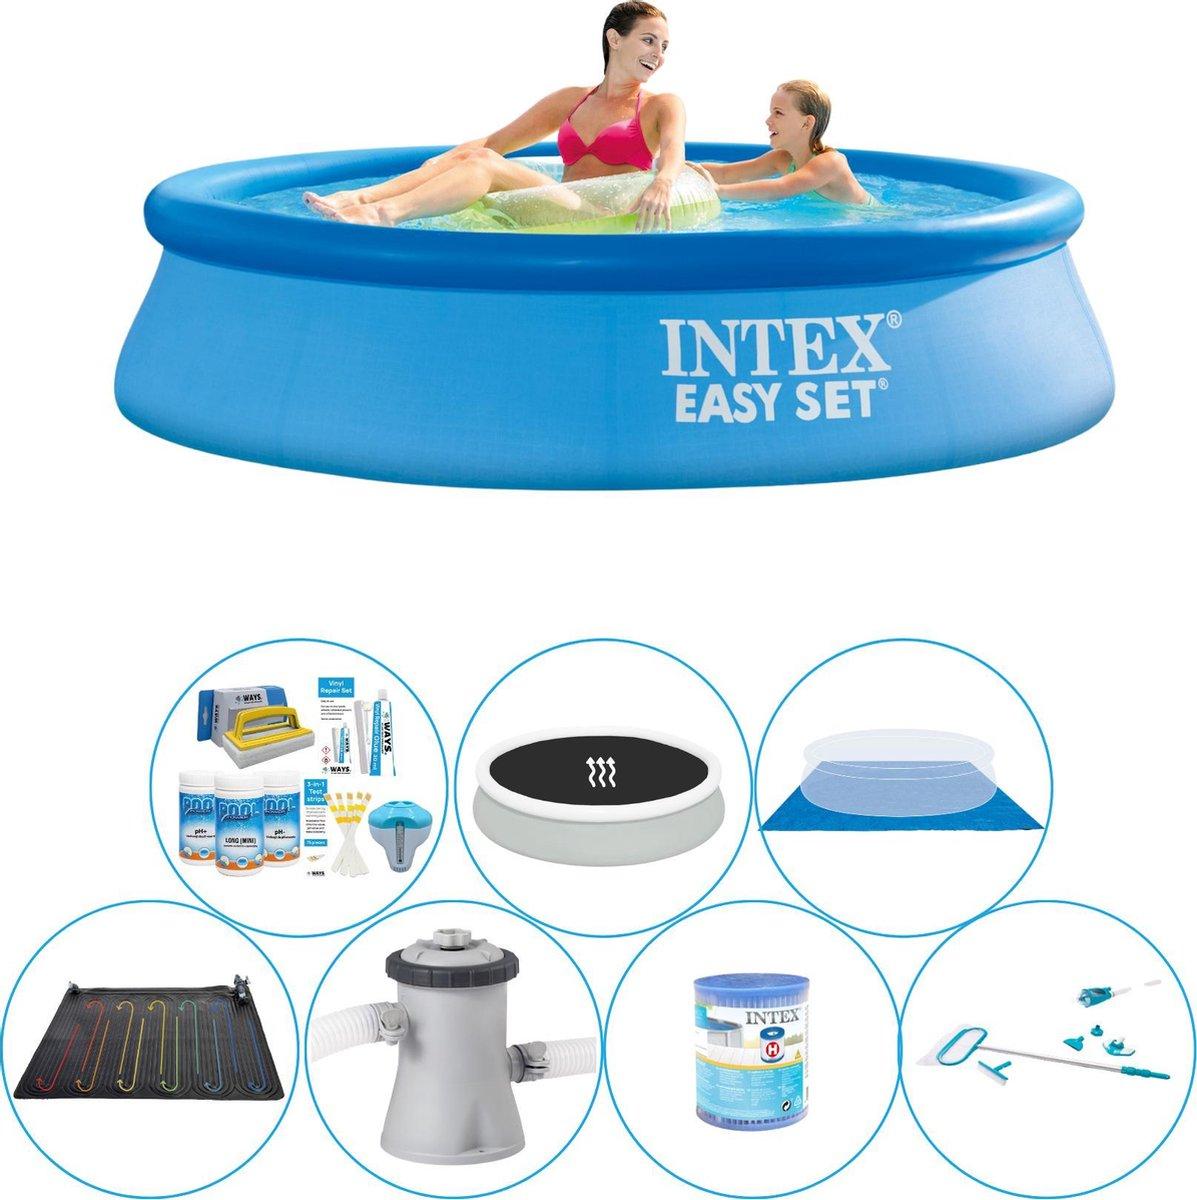 Intex Easy Set Rond 244x61 cm - Alles in 1 Zwembad Set